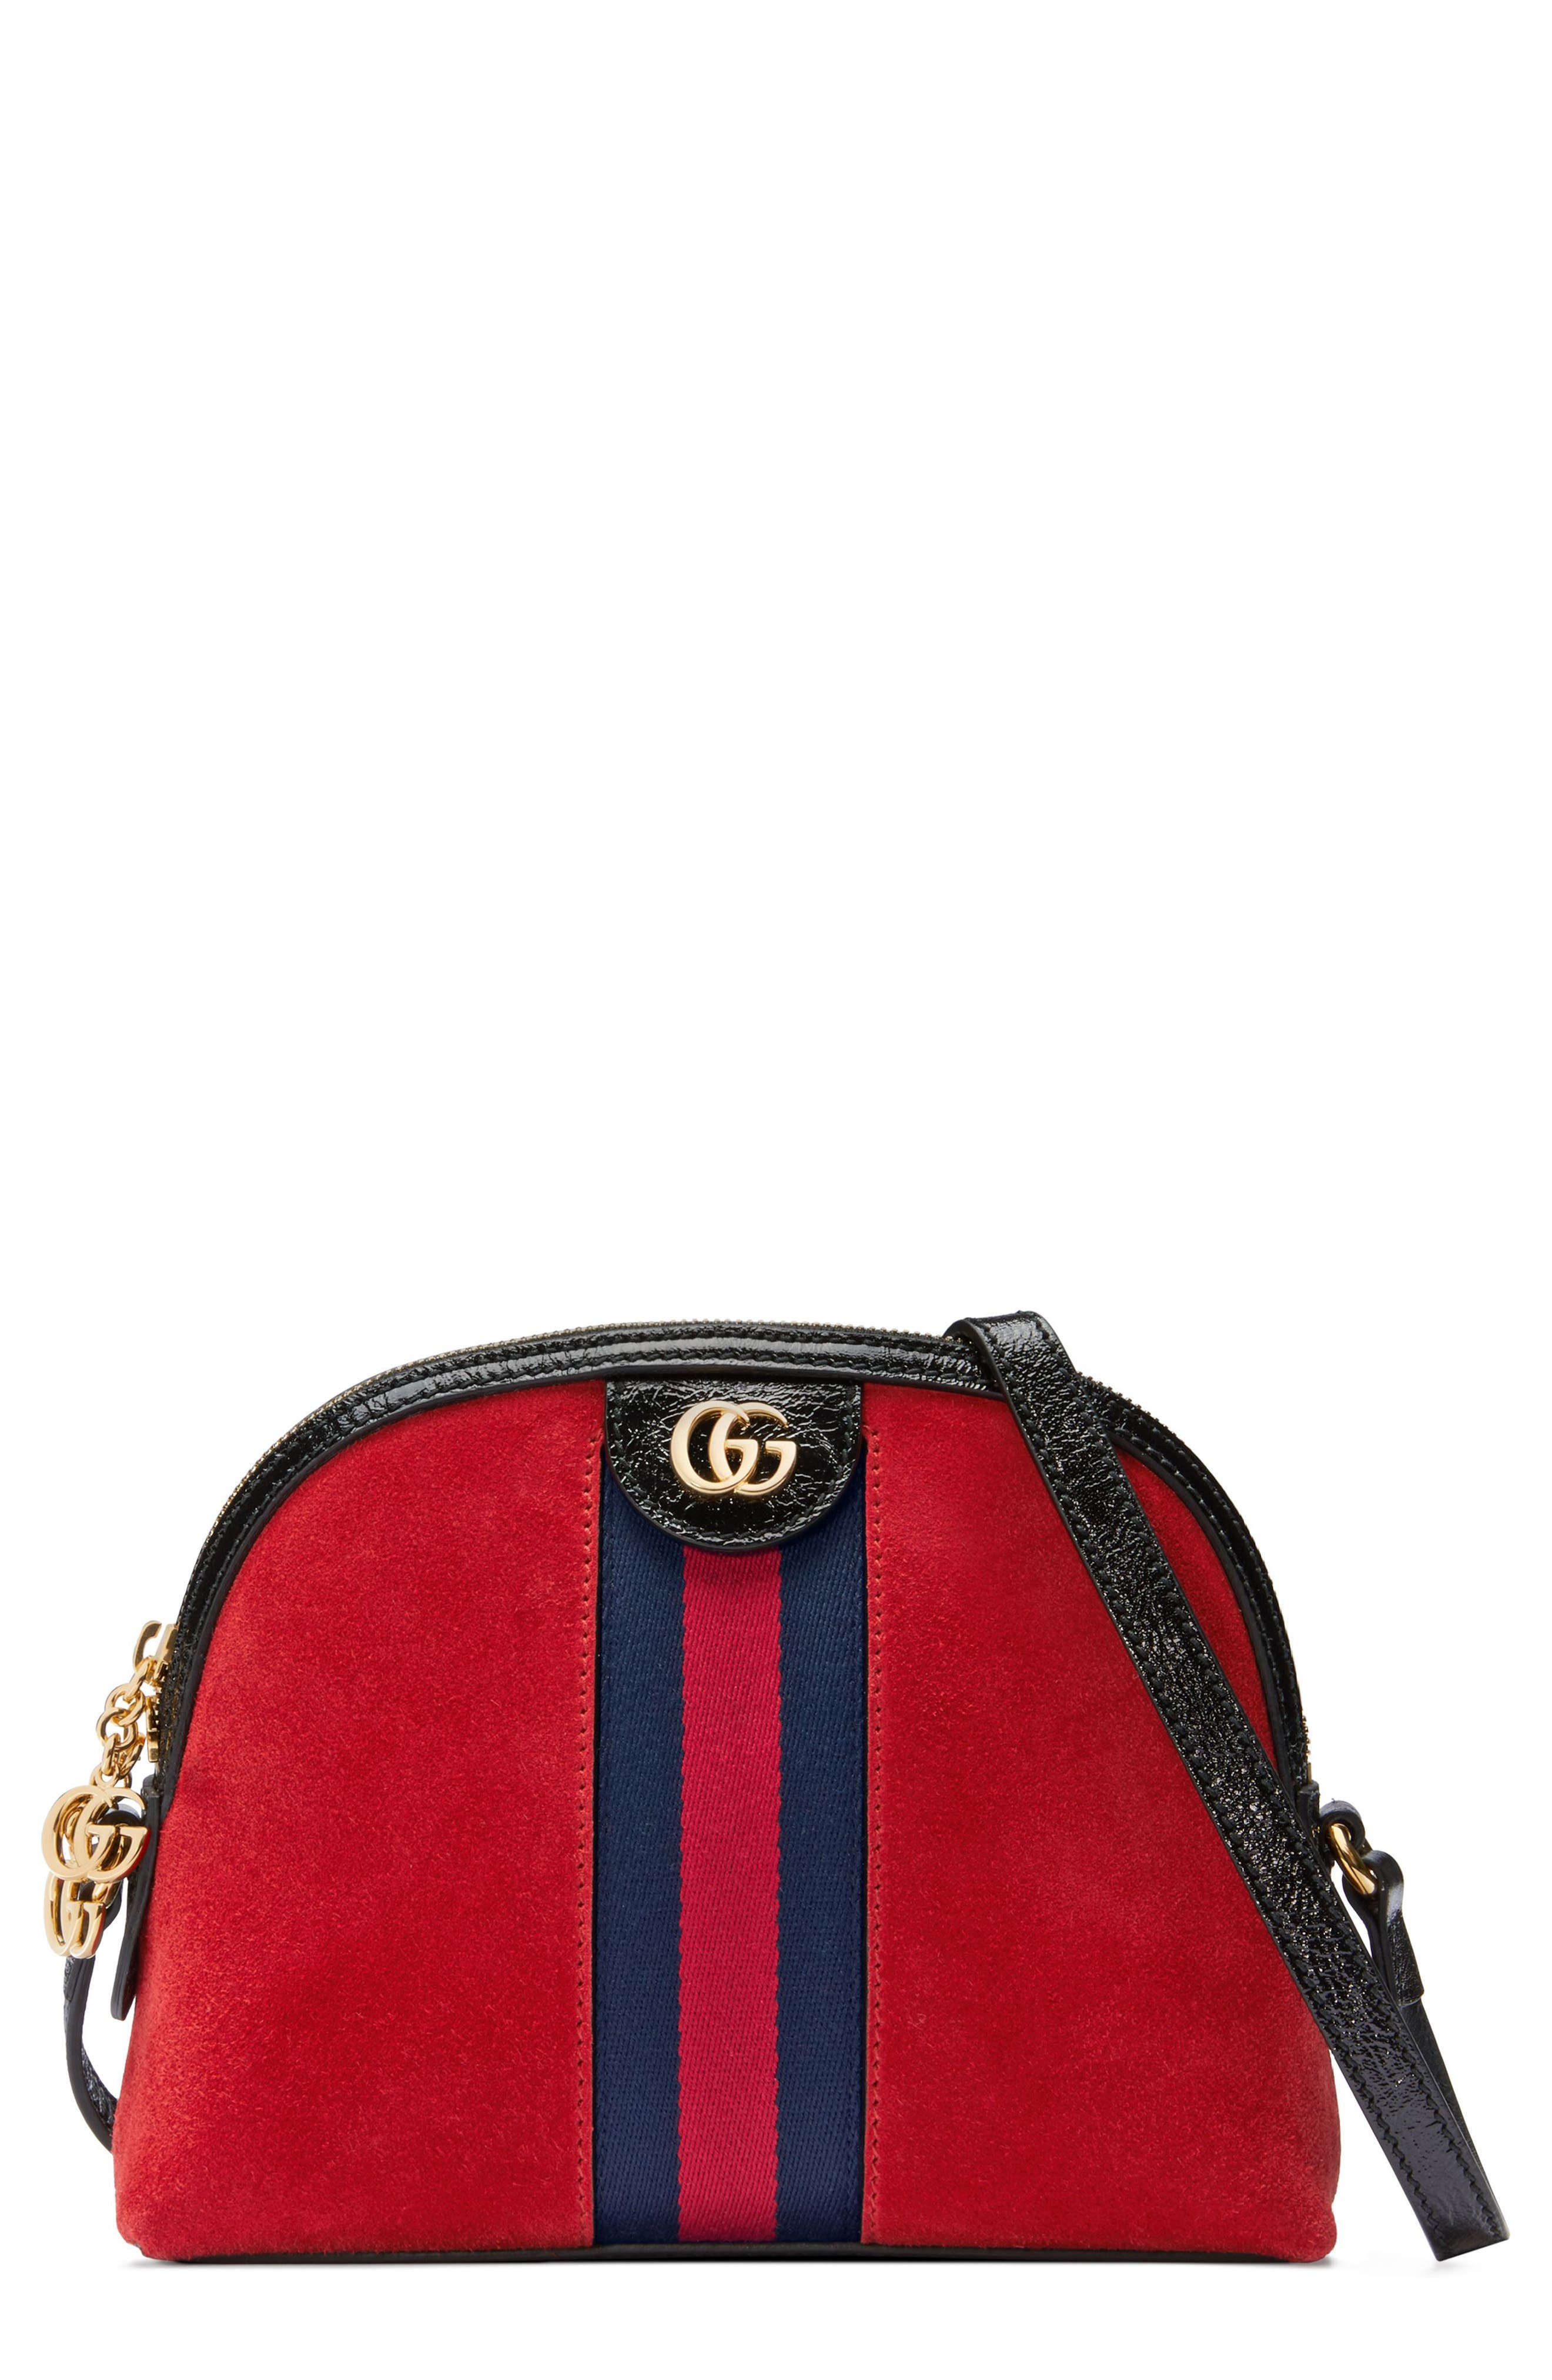 Alternate Image 1 Selected - Gucci Small Suede Shoulder Bag